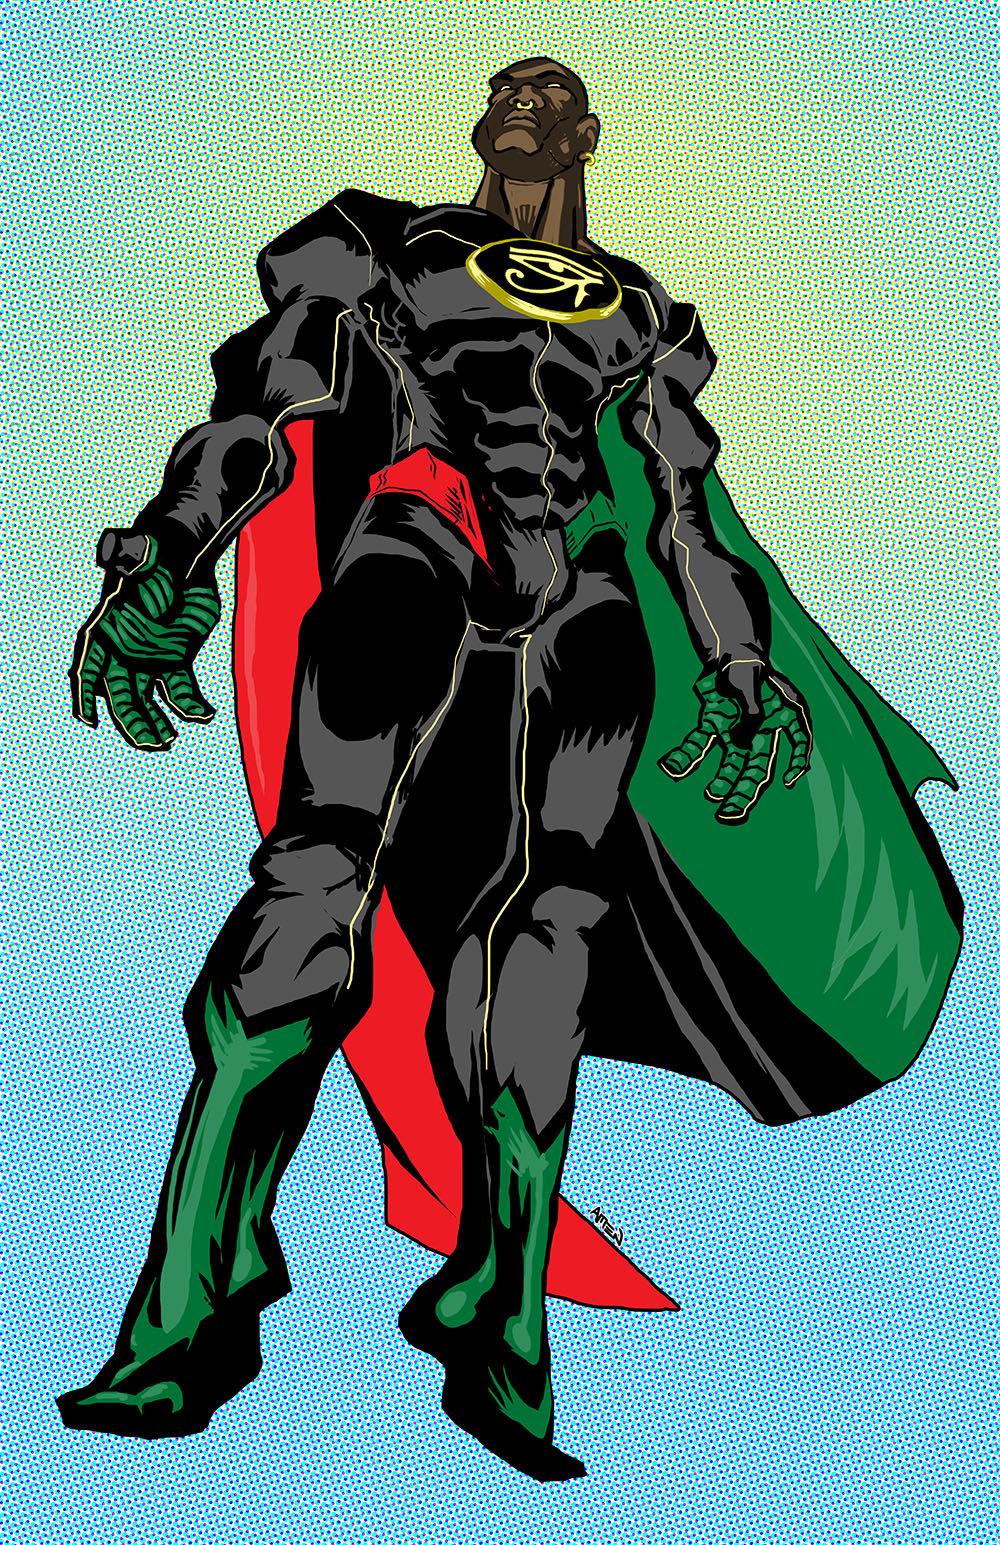 """Super Heru"" created by J.R. Lemar, artwork by Samax Amen"